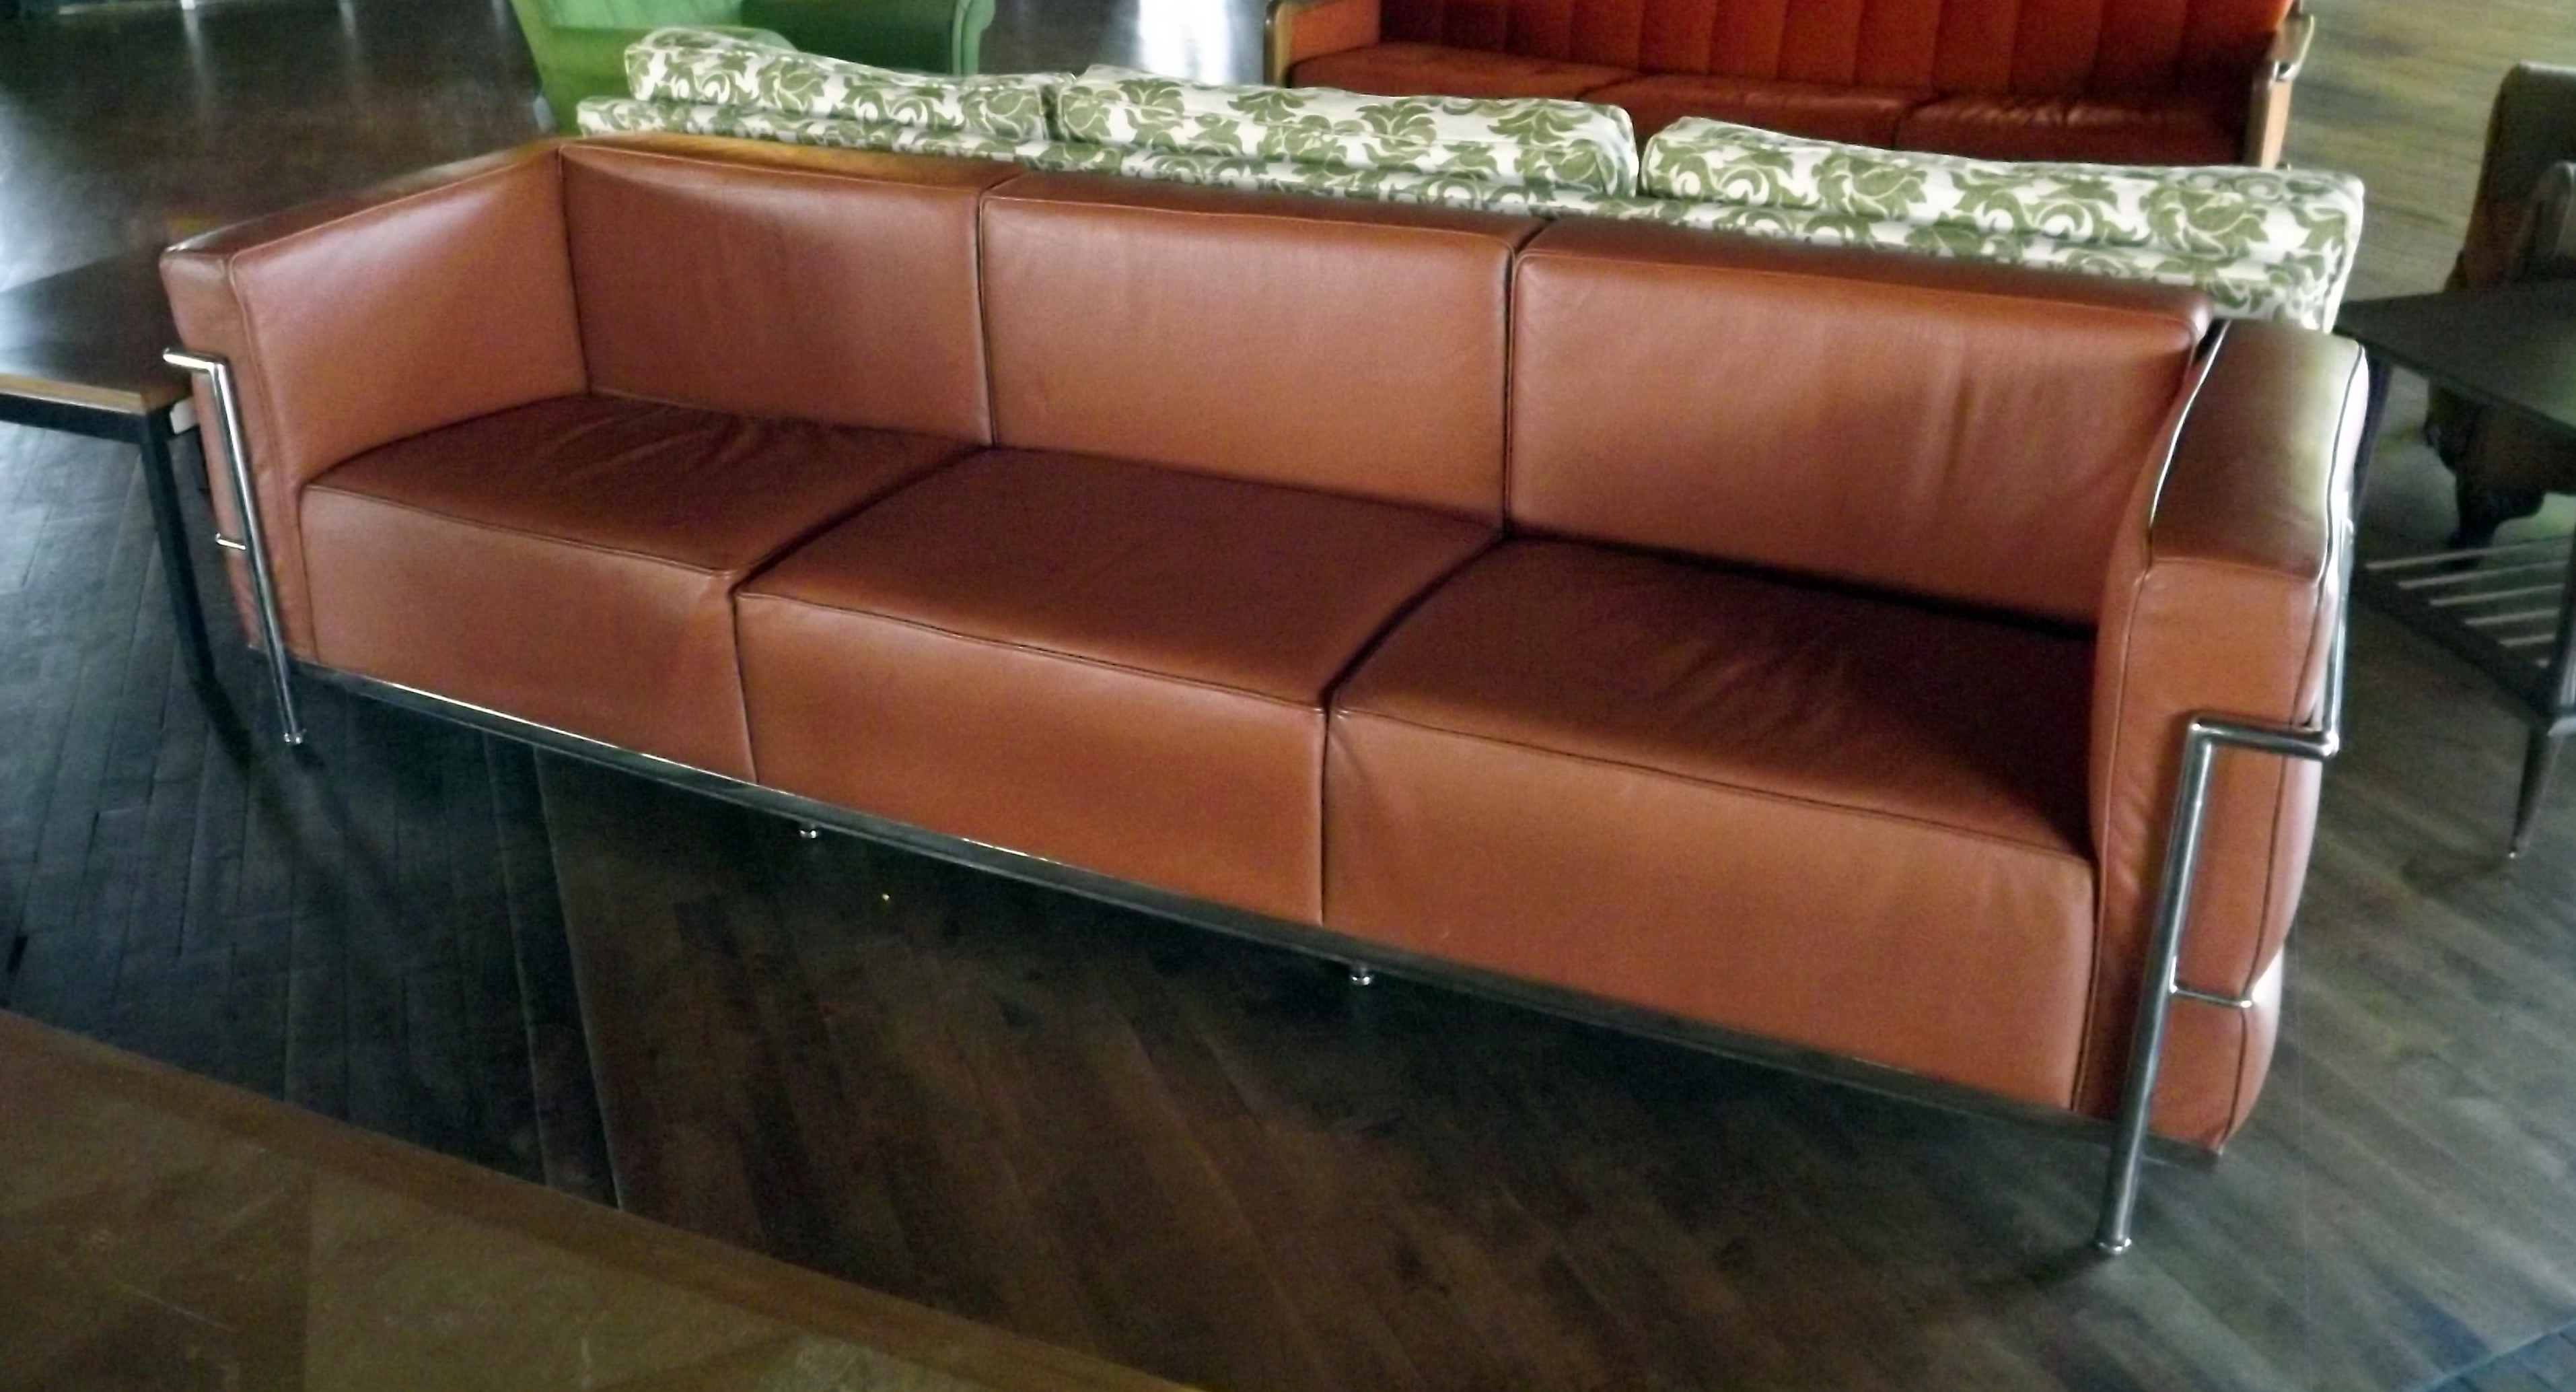 Home / Furniture / Seating / Le Corbusier LC3 Sofa Replica In Brown Leather